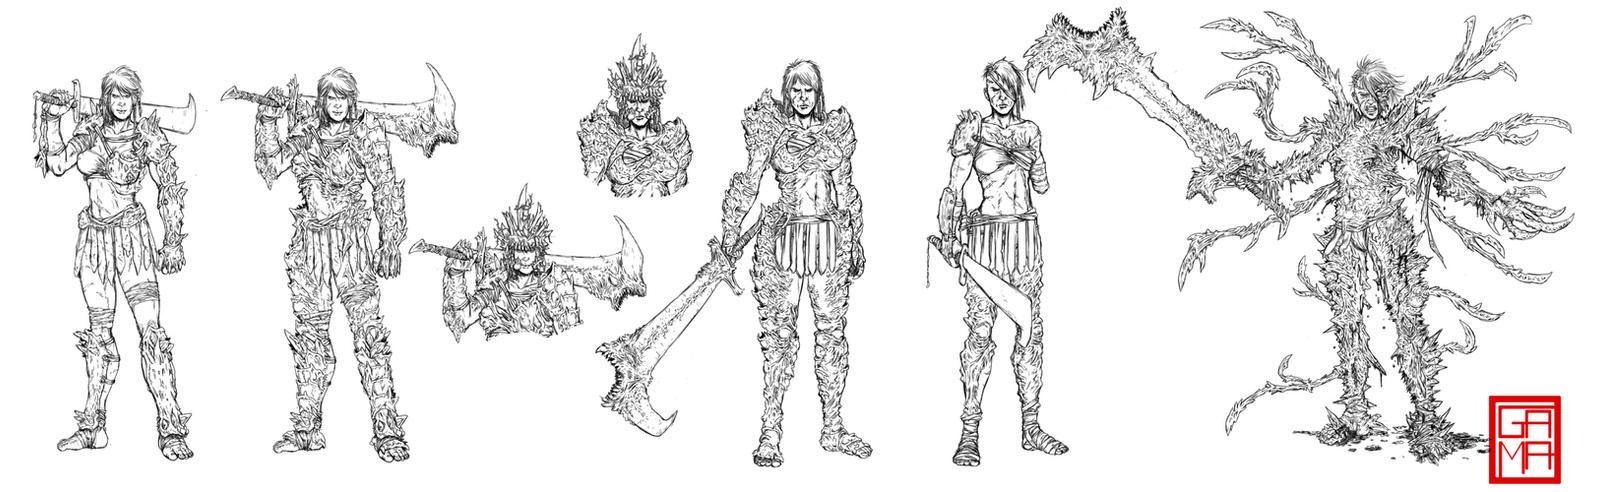 Amazzoni Character Designs: Vechernjaja (Veterana) by GaetanoMatruglio